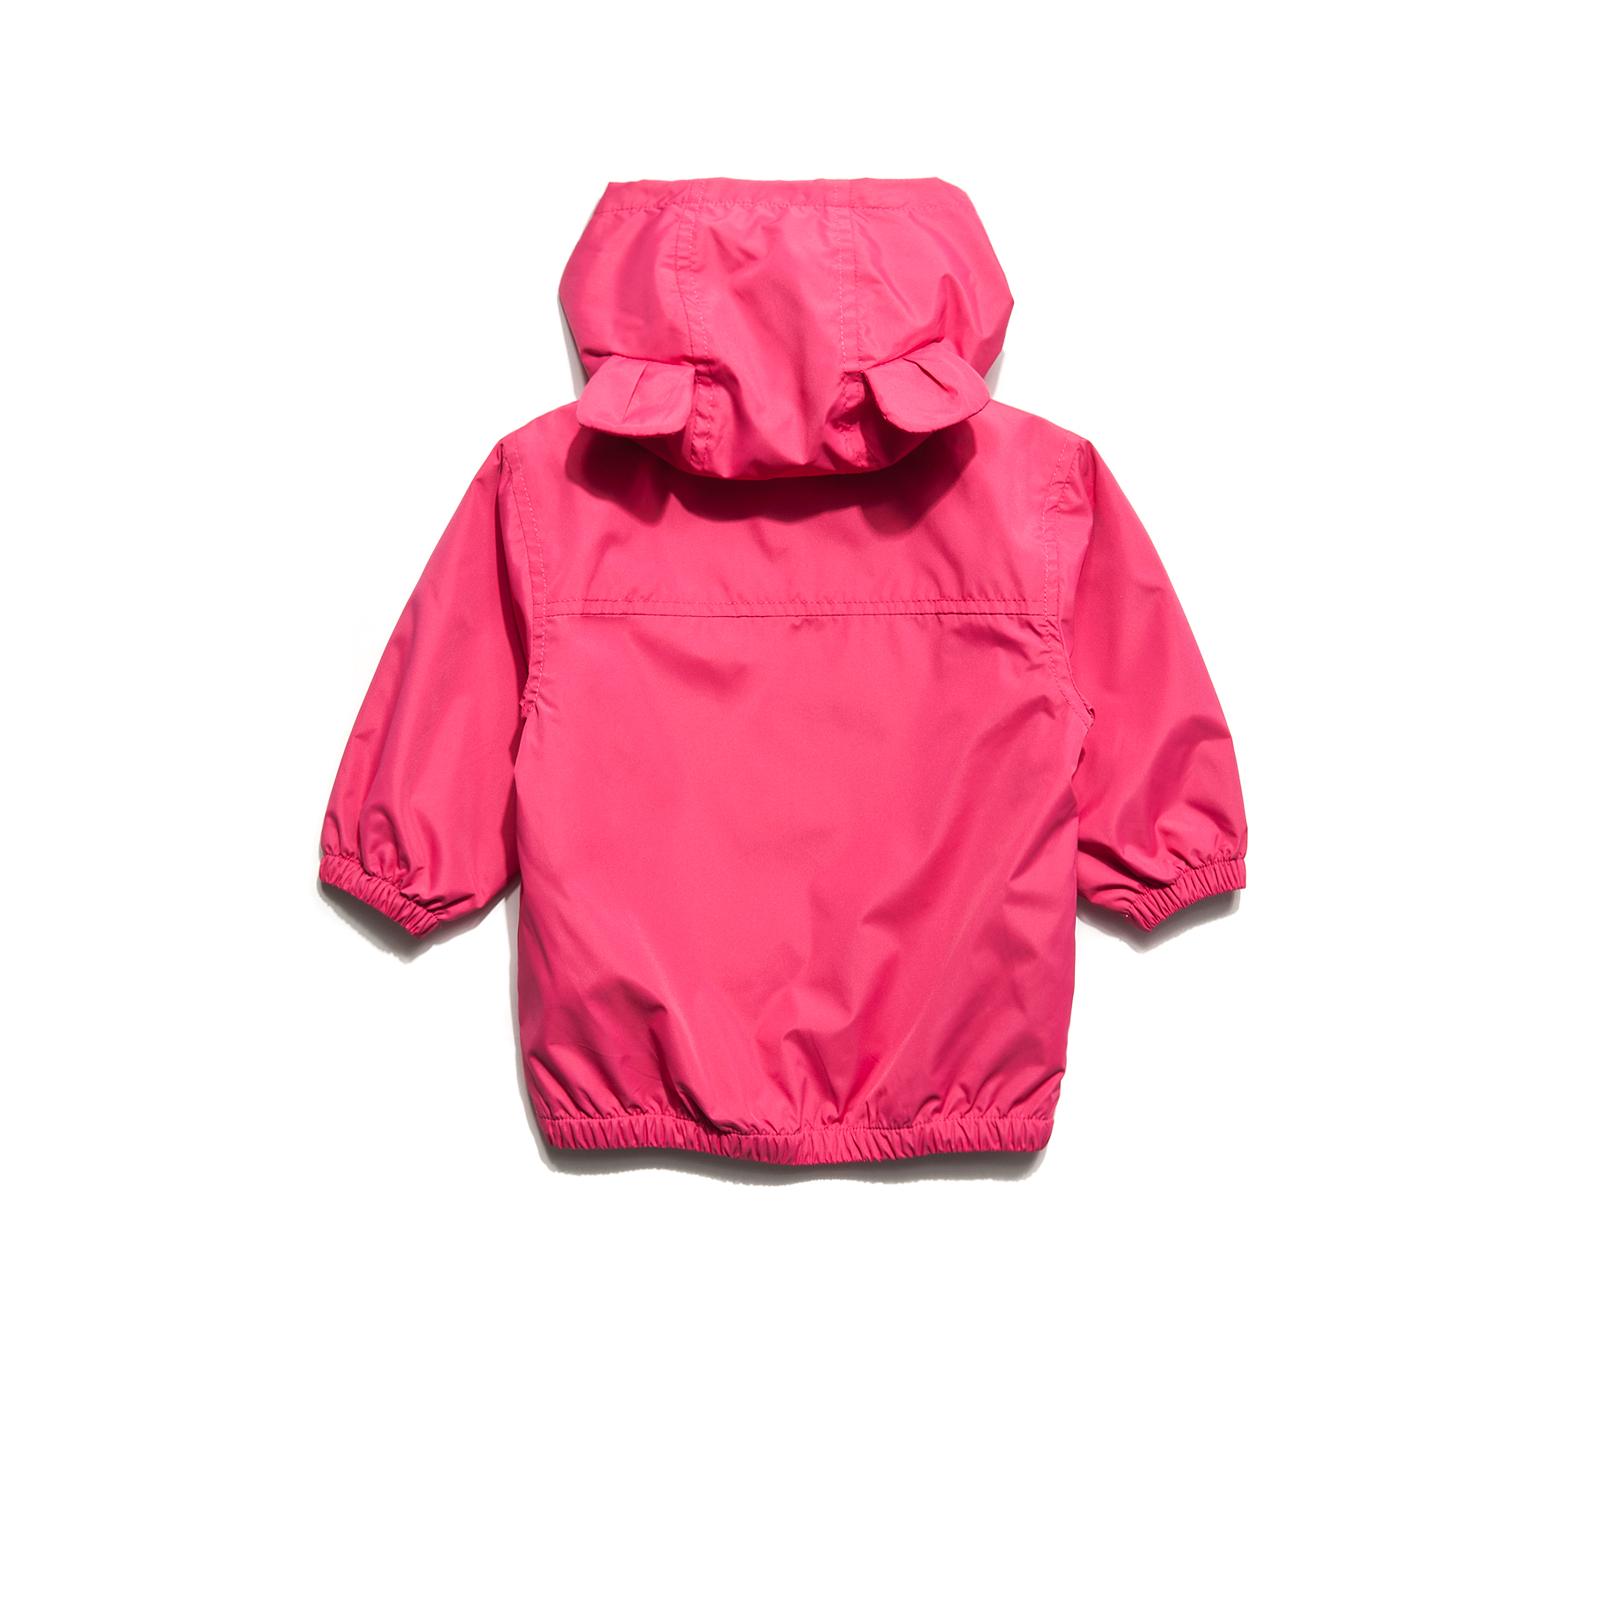 Куртка 5.10.15. Размер 86 от Младенец.ru